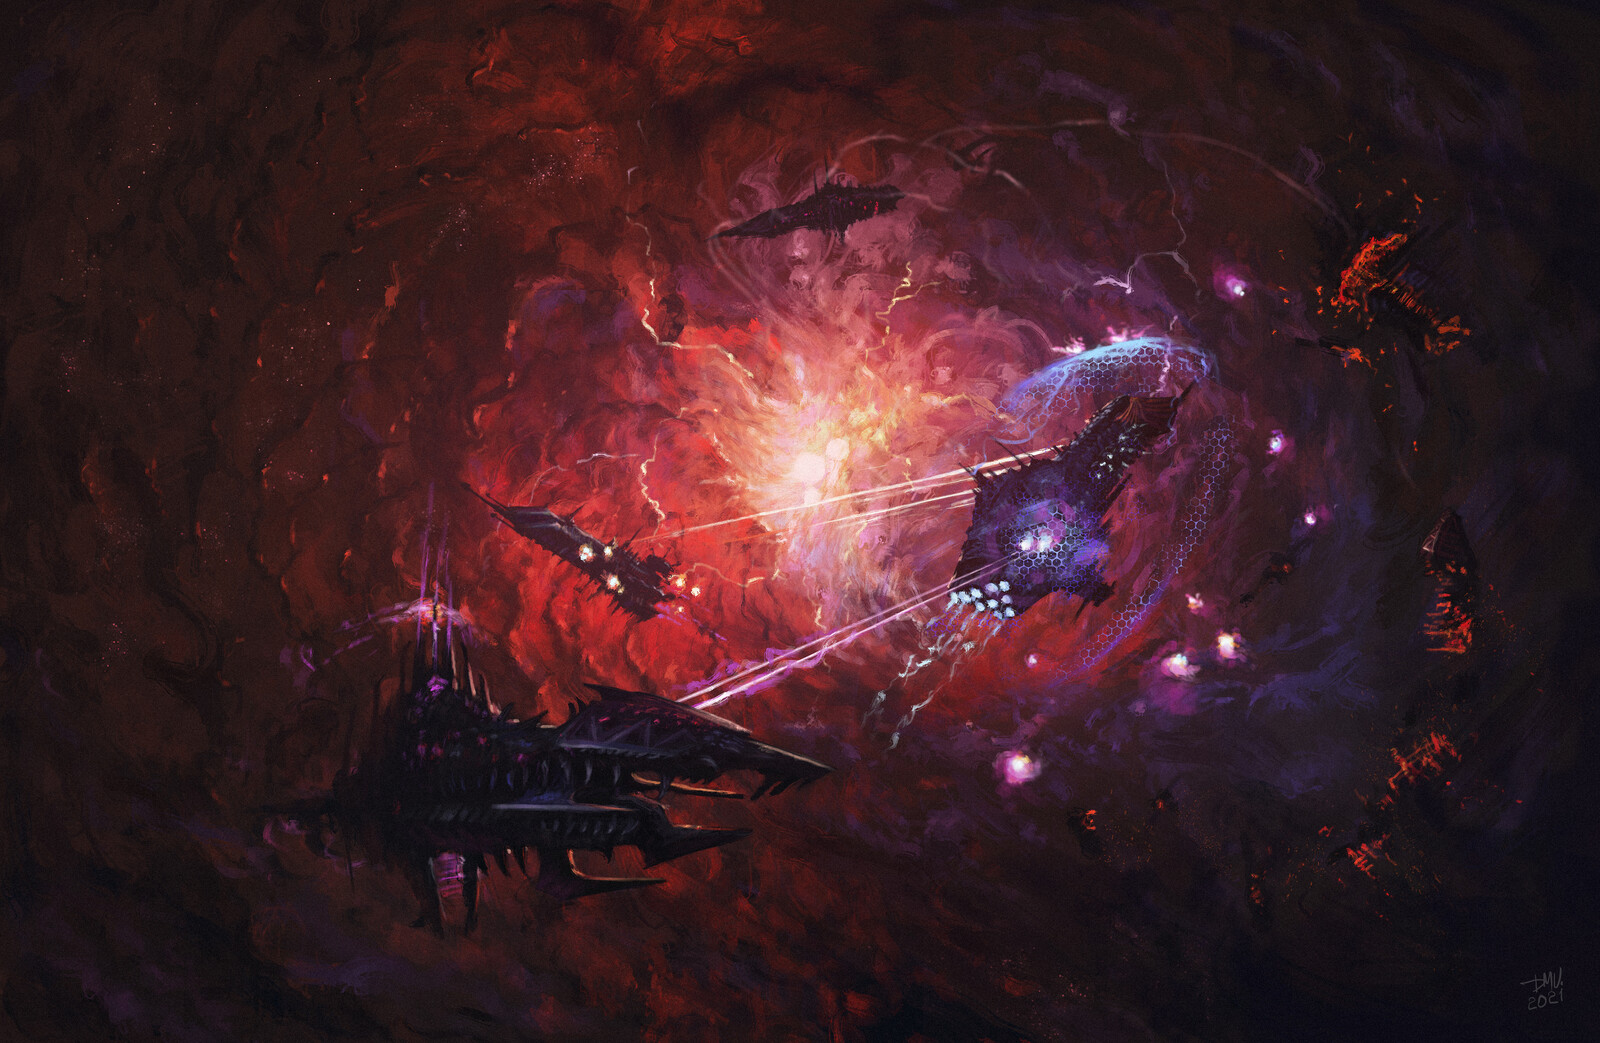 Battle of Spaceships